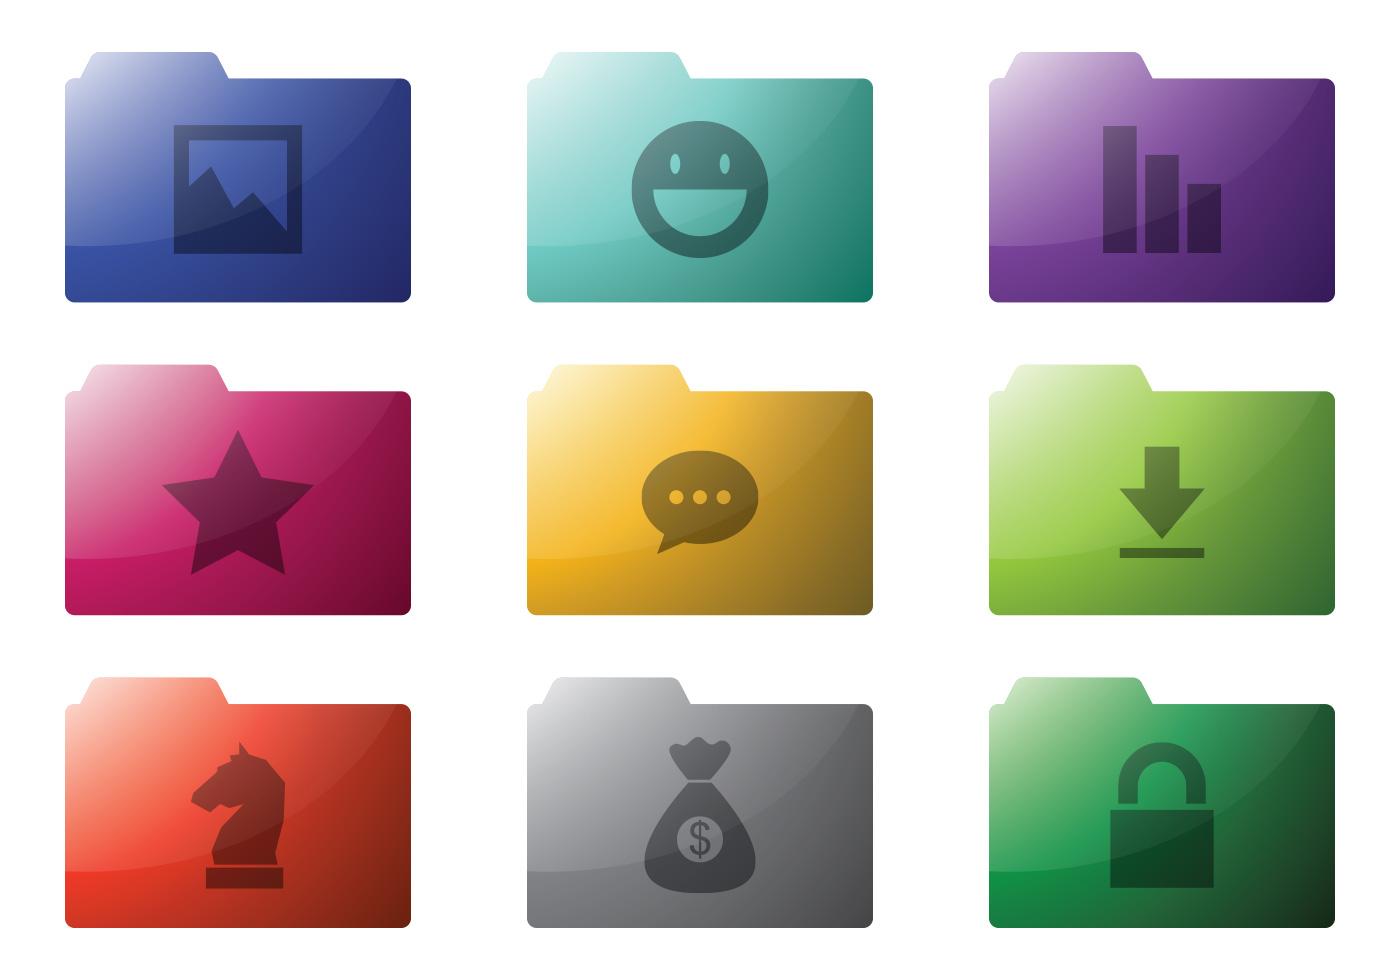 Icon Converter. Convert Image to Icon